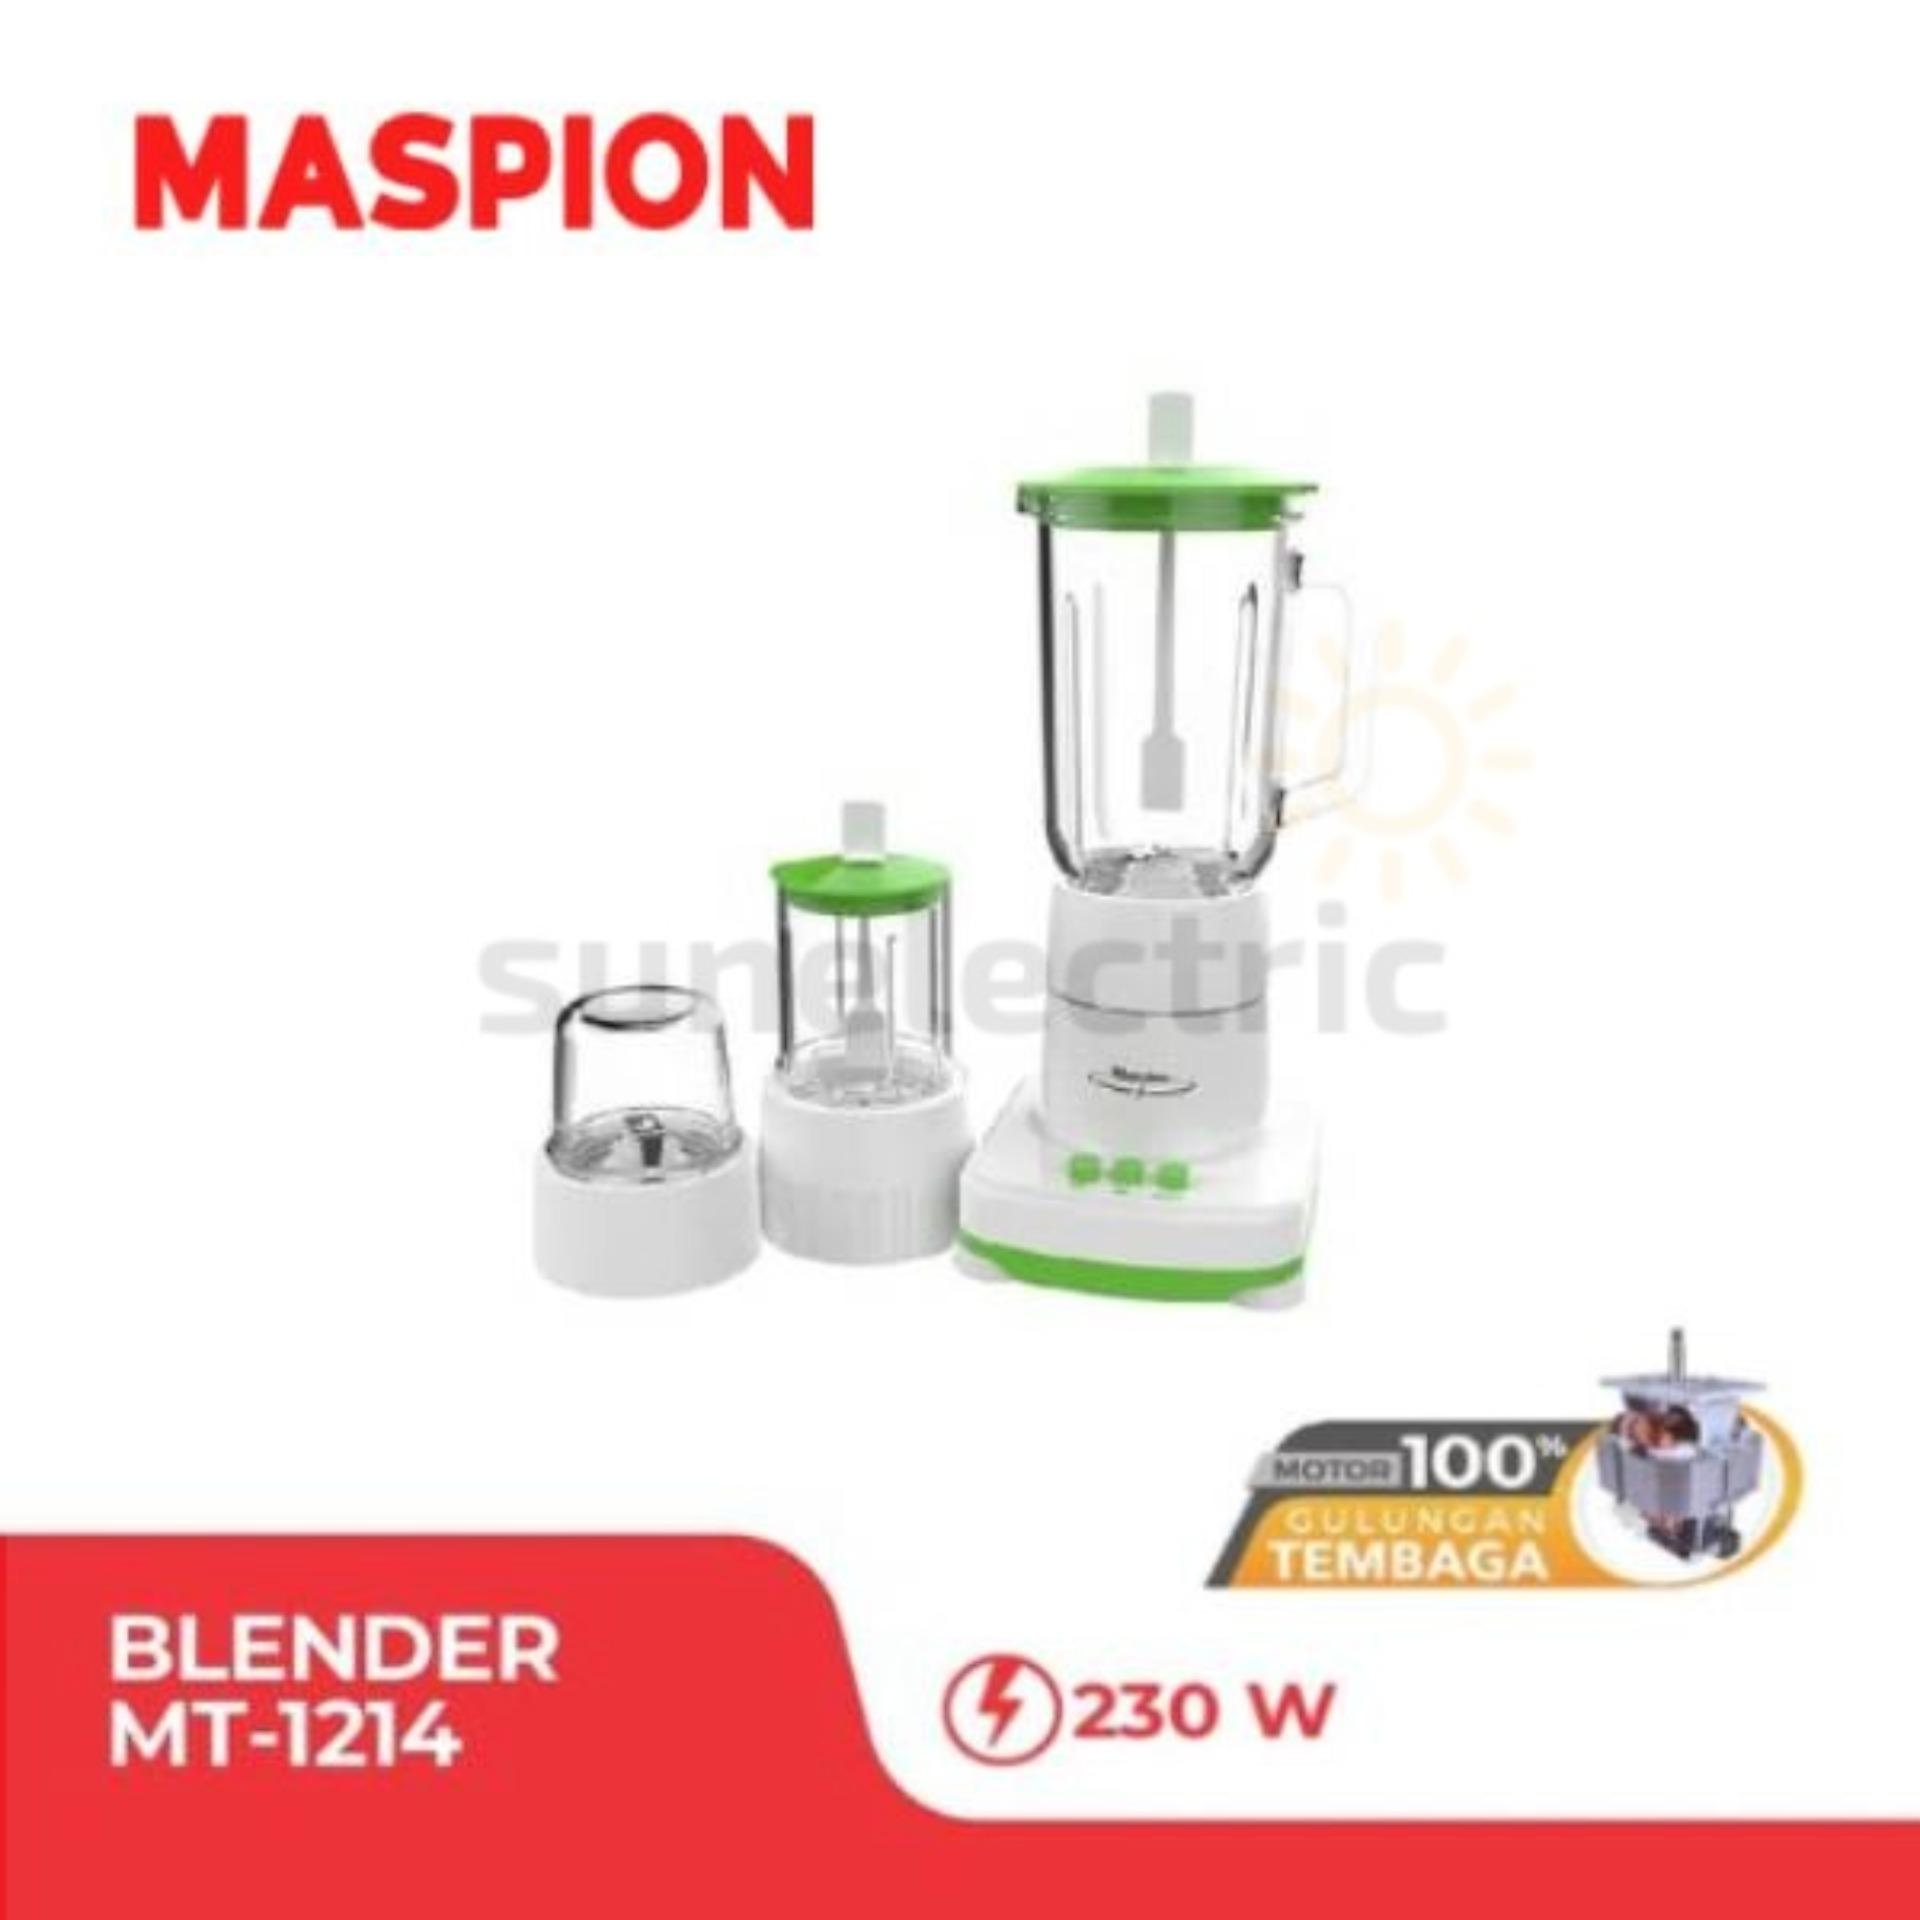 Maspion MT-1214 Blender Kaca + Dry + Wet Mill 3-in-1 Kapasitas 1 Liter